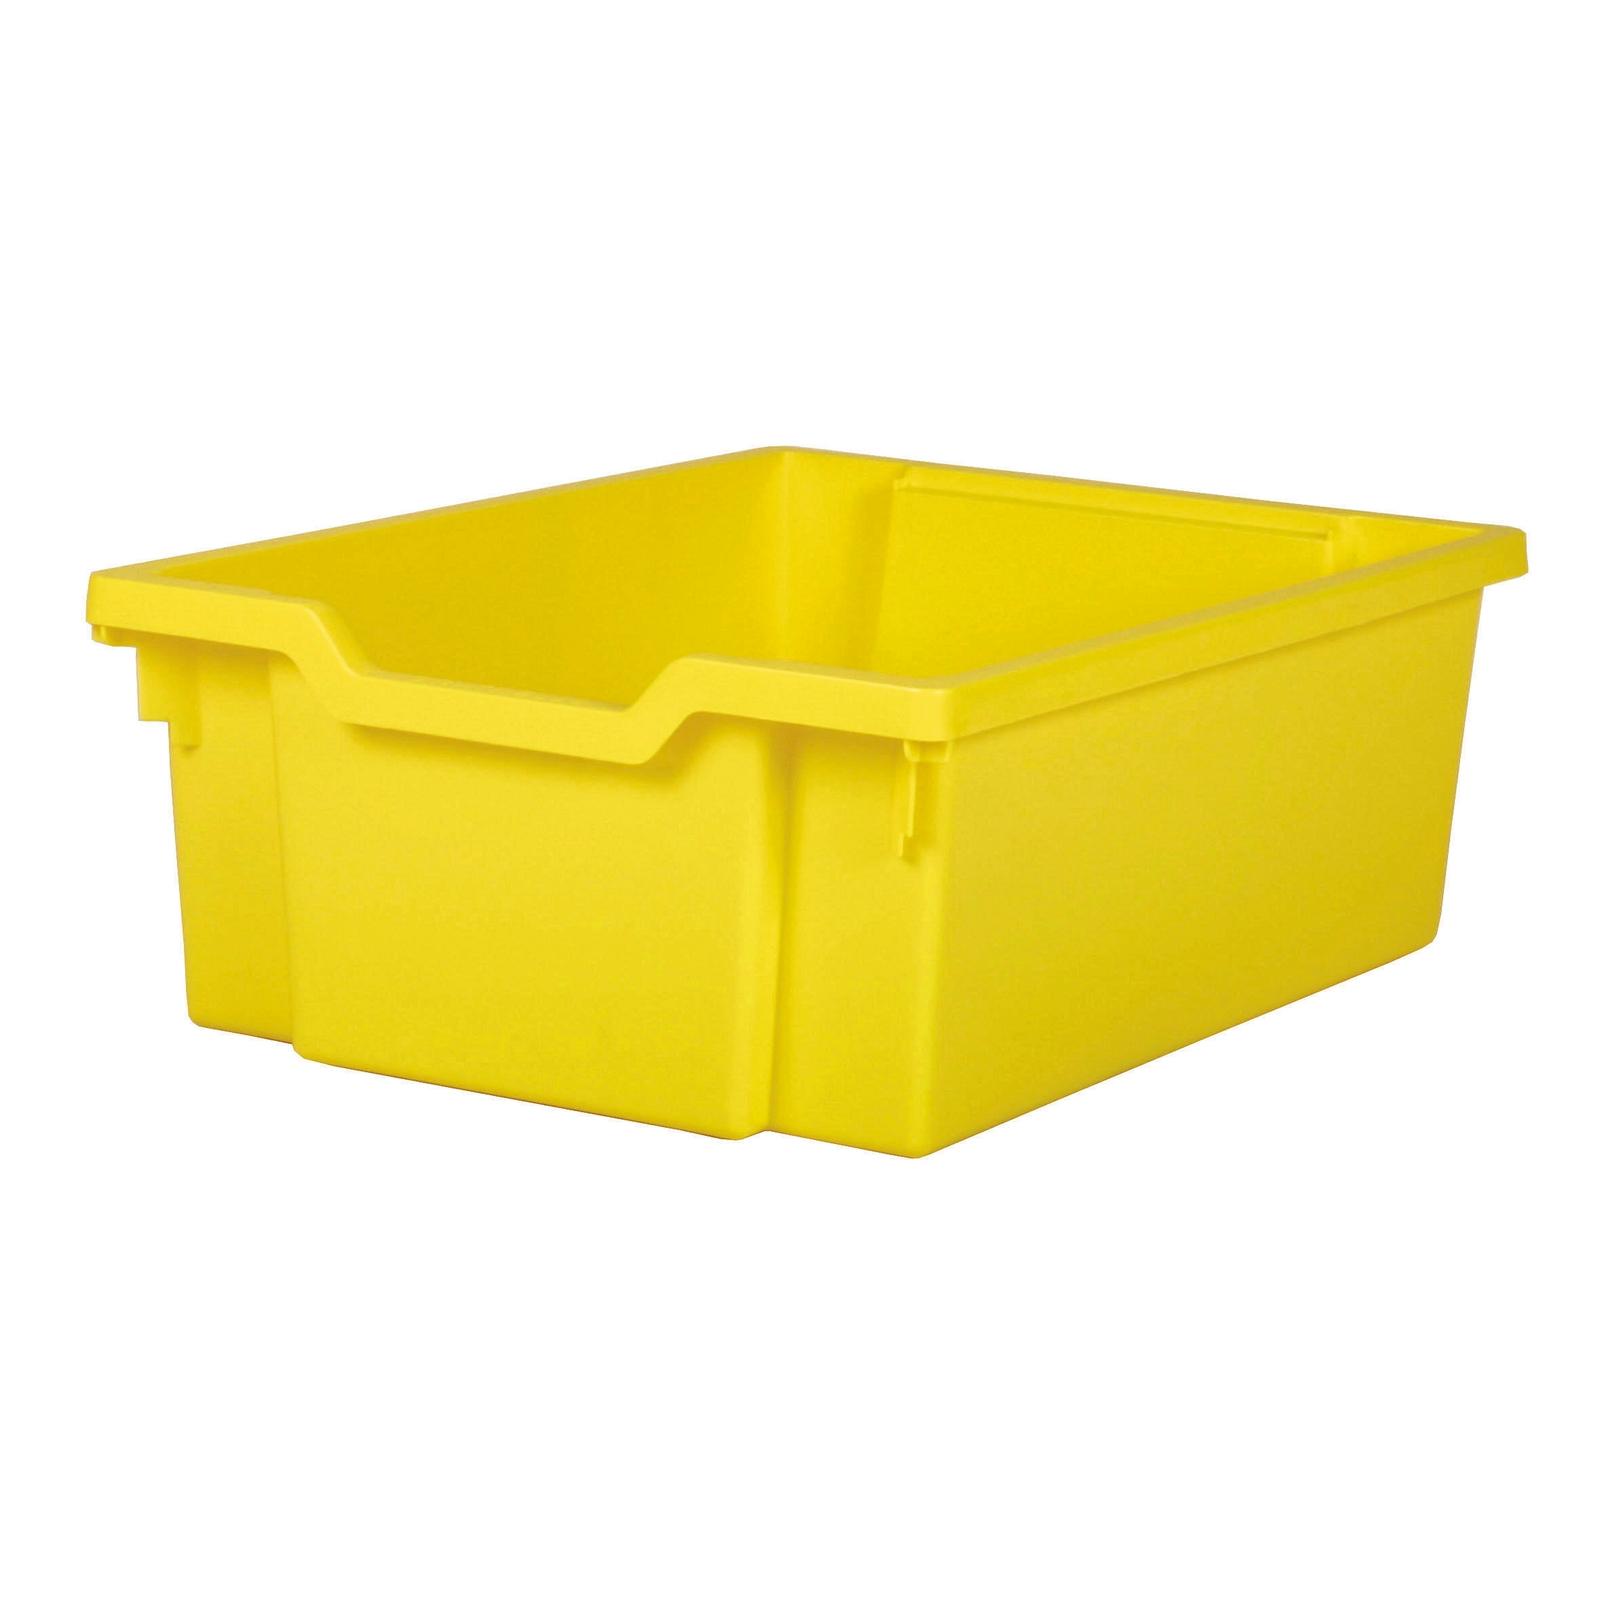 Gratnells Deep Storage Tray - Yellow